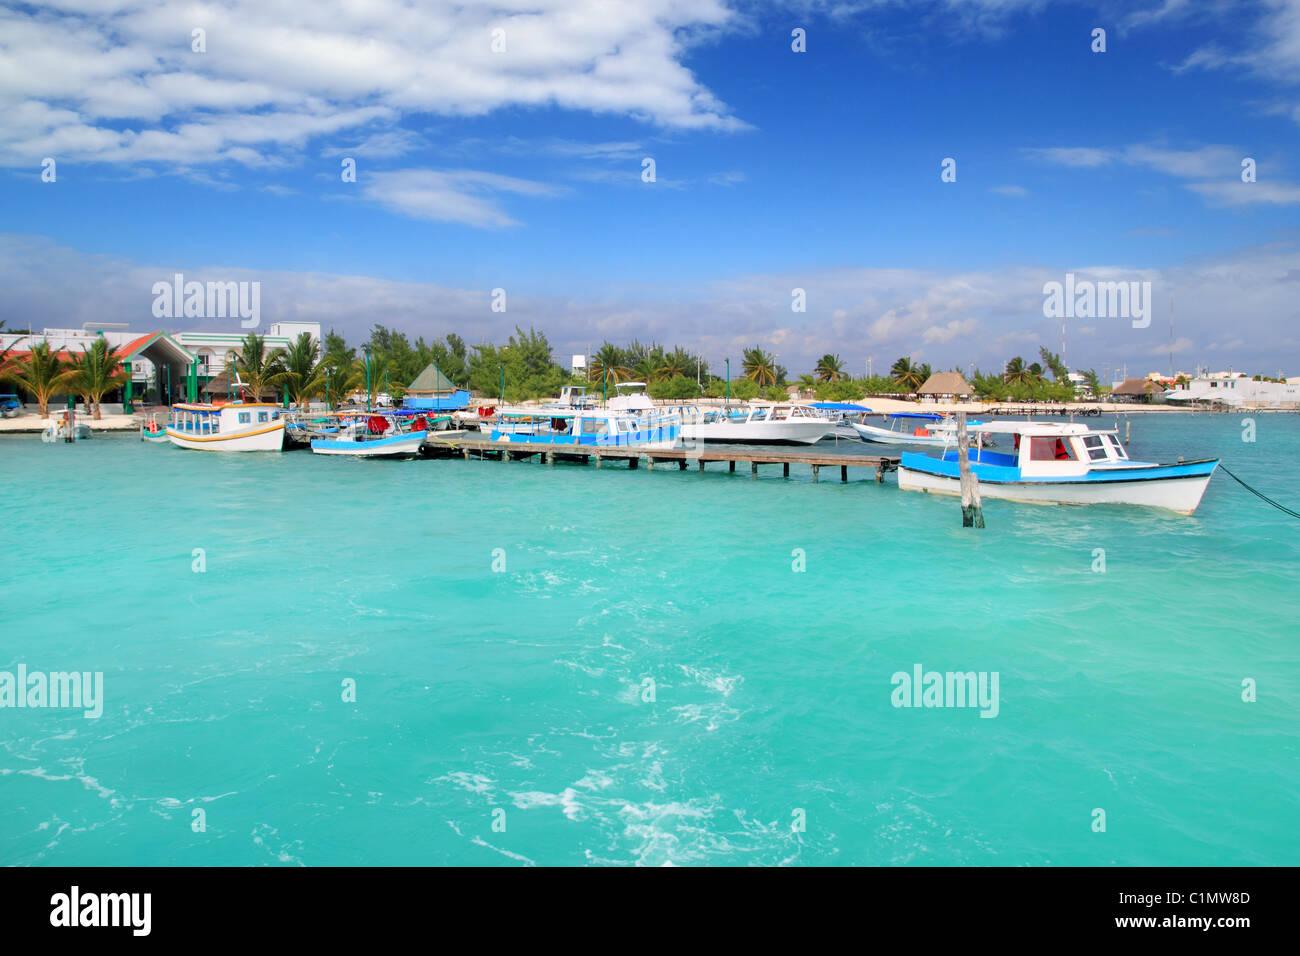 Puerto Juarez Cancun Quintana Roo tropischen Karibik Boote Stockbild